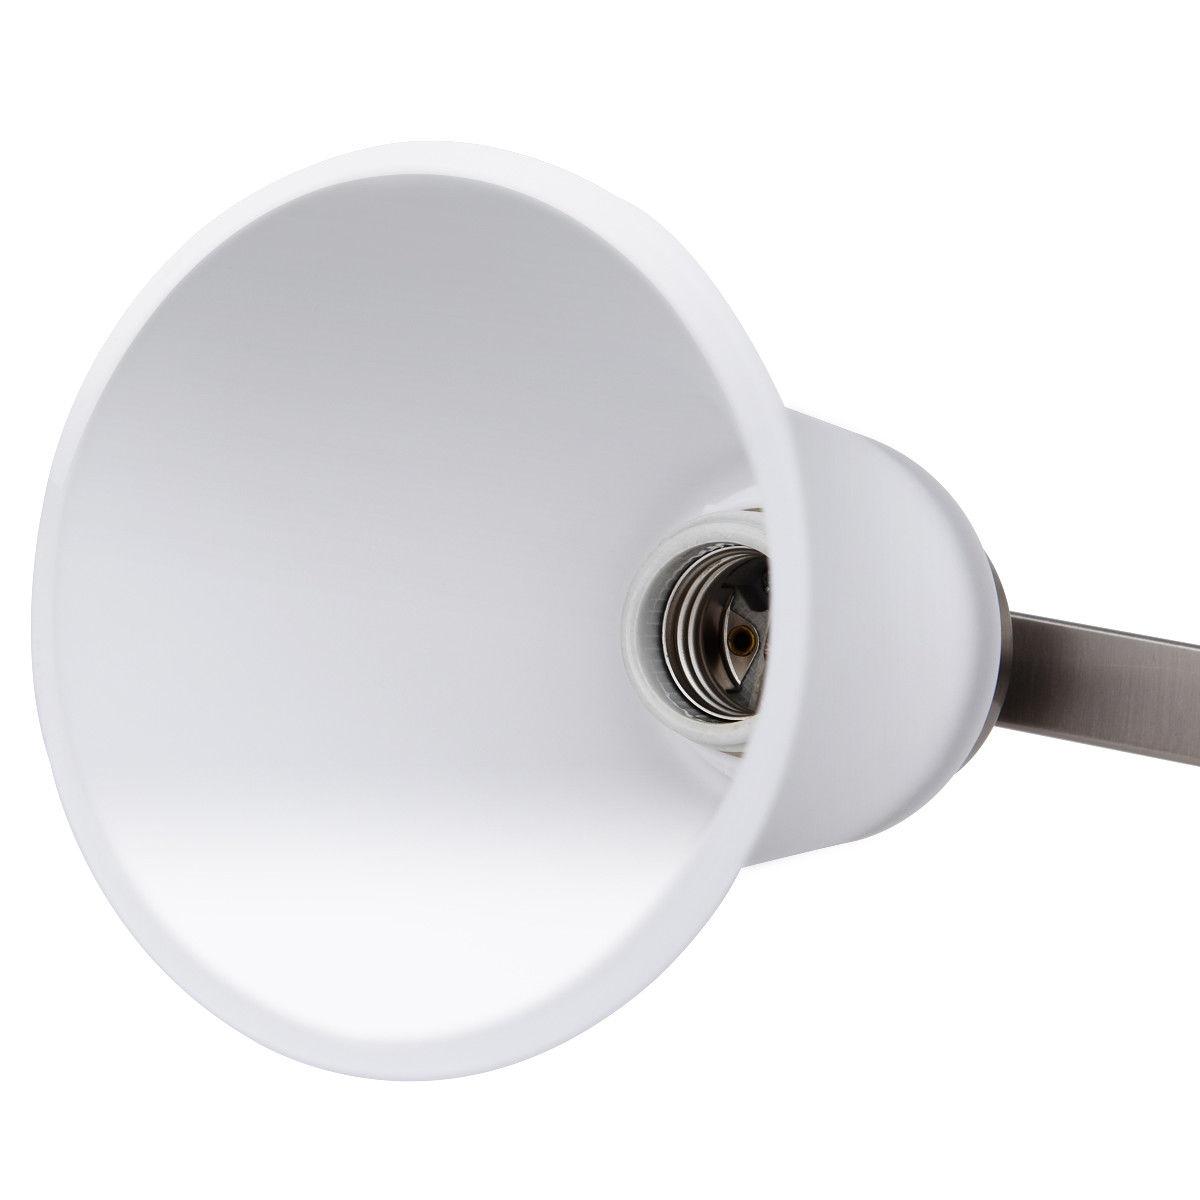 4-Light Vanity Light w/ Nickel Finish and Glass Shade